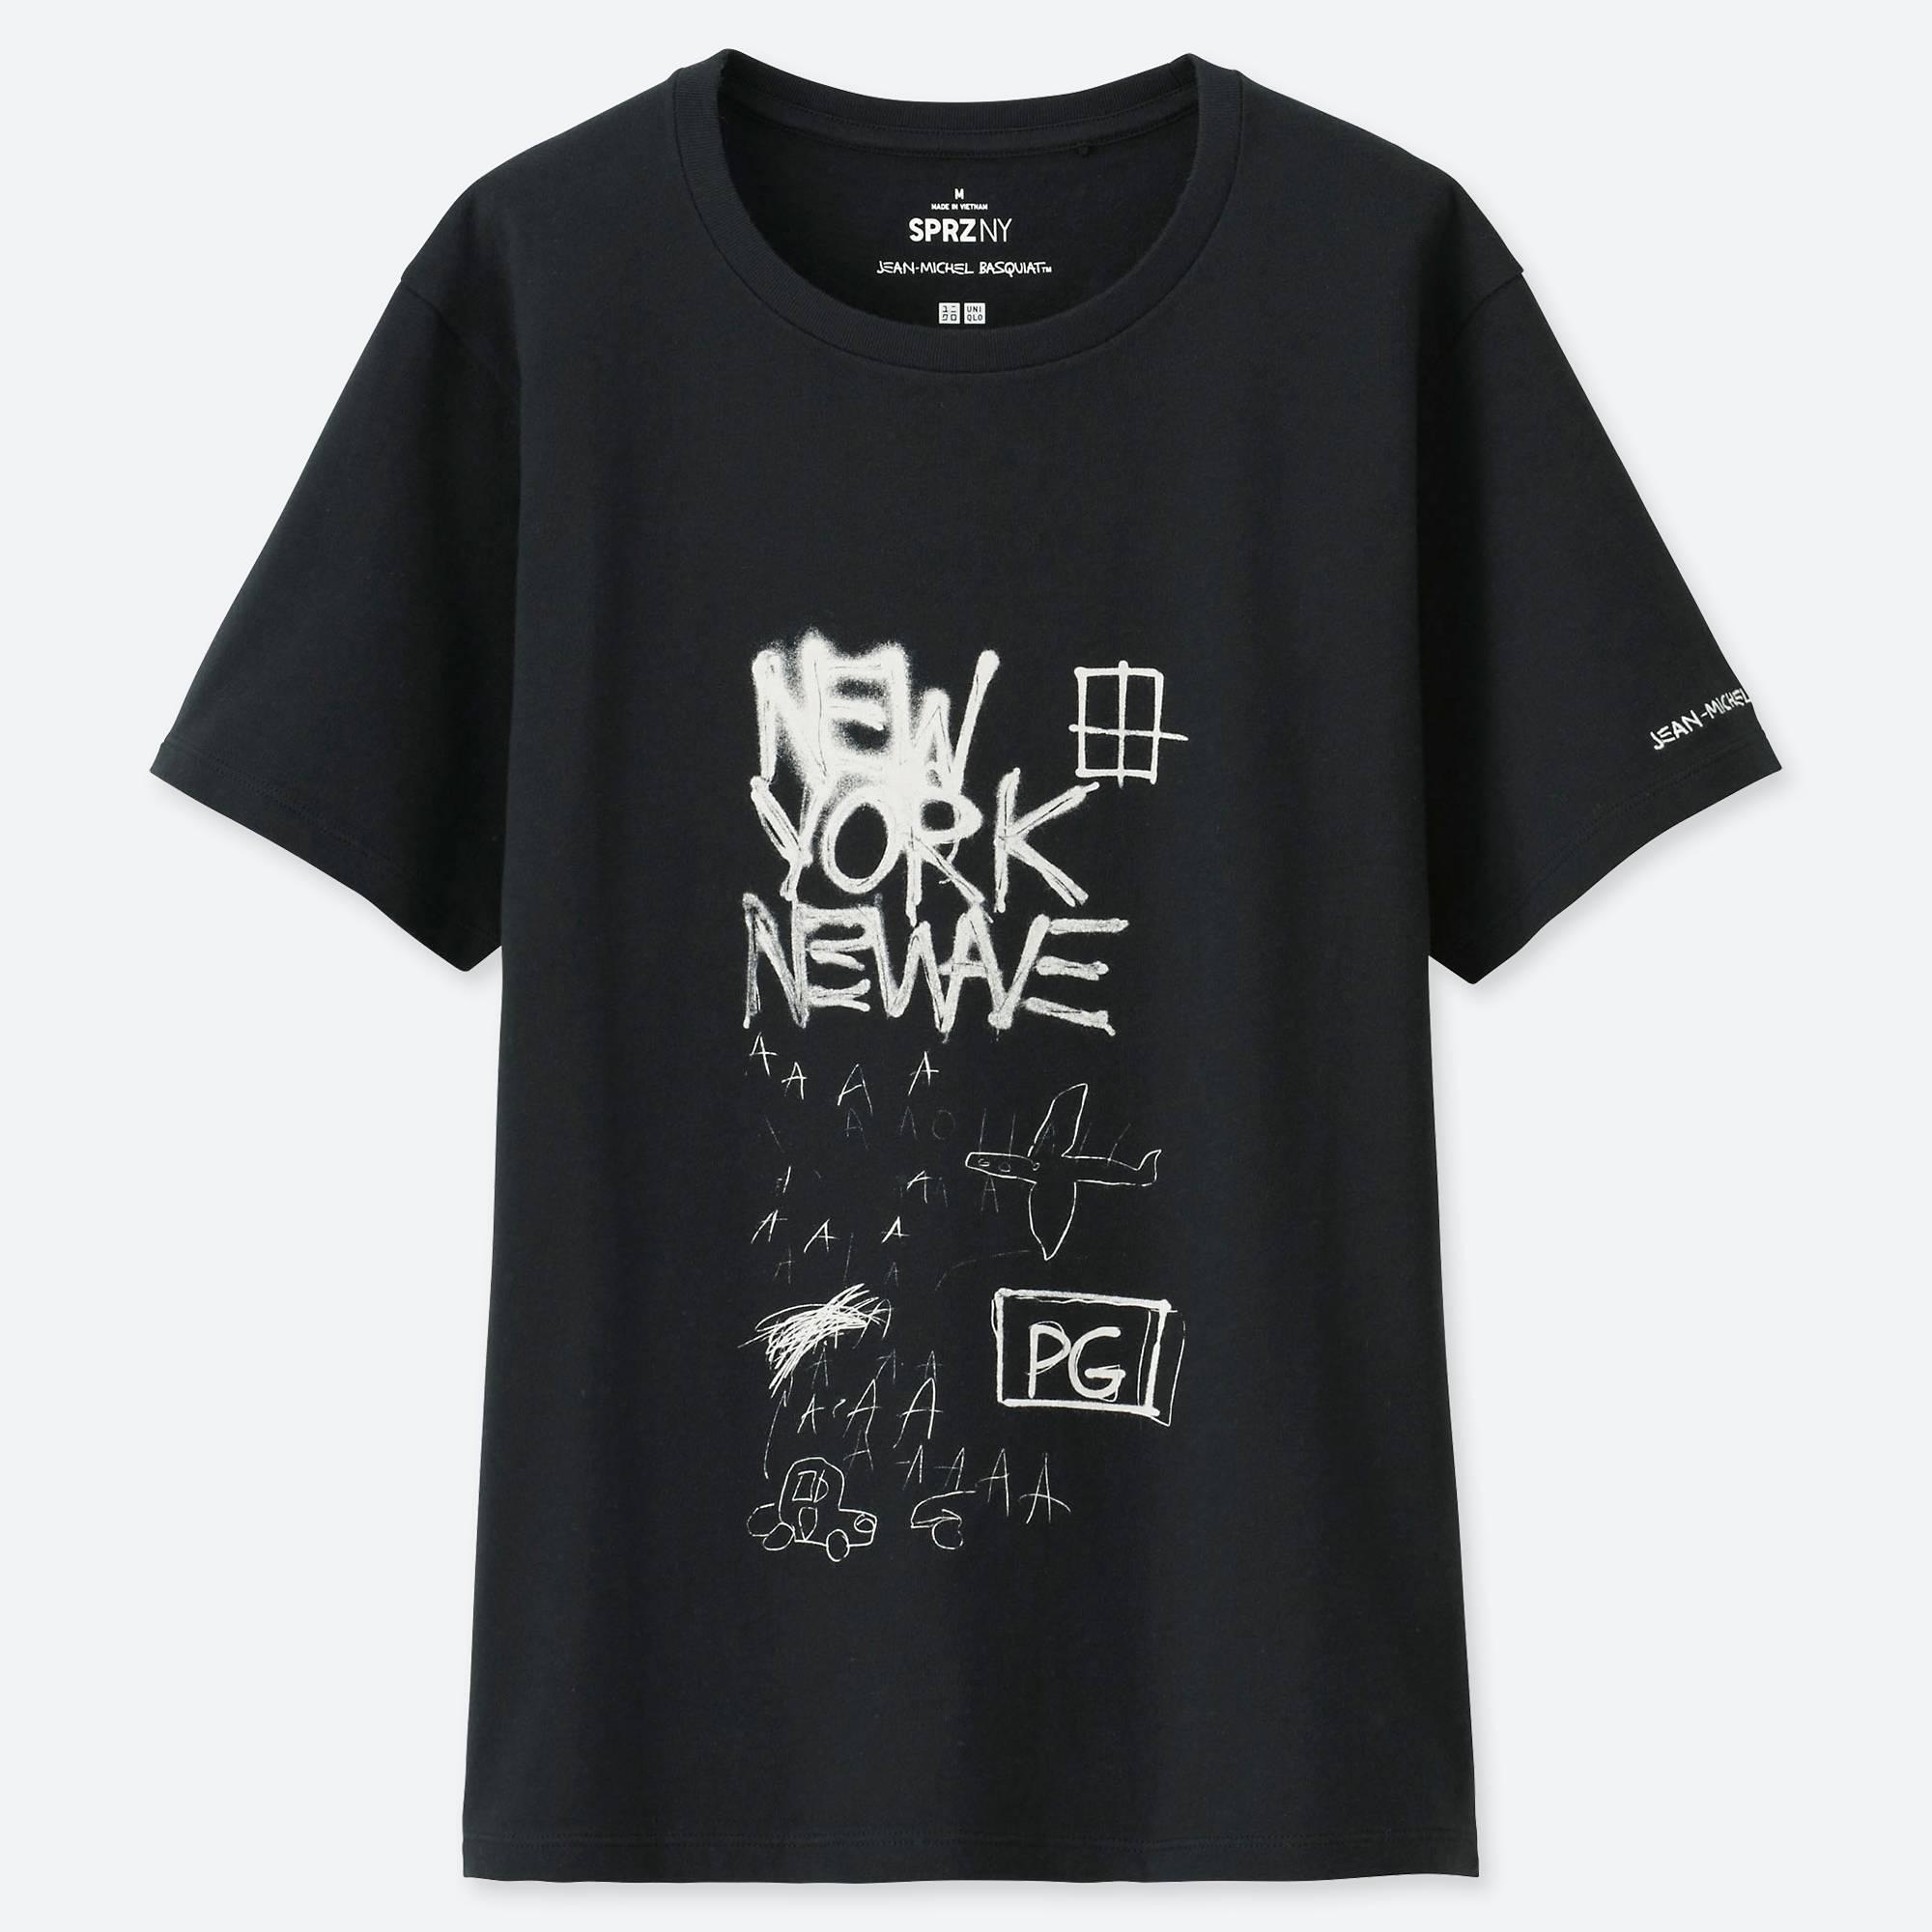 2fa743ca4bb9a9 Uniqlo - Black Women Sprz Ny Short-sleeve Graphic T-shirt (jean-. View  fullscreen